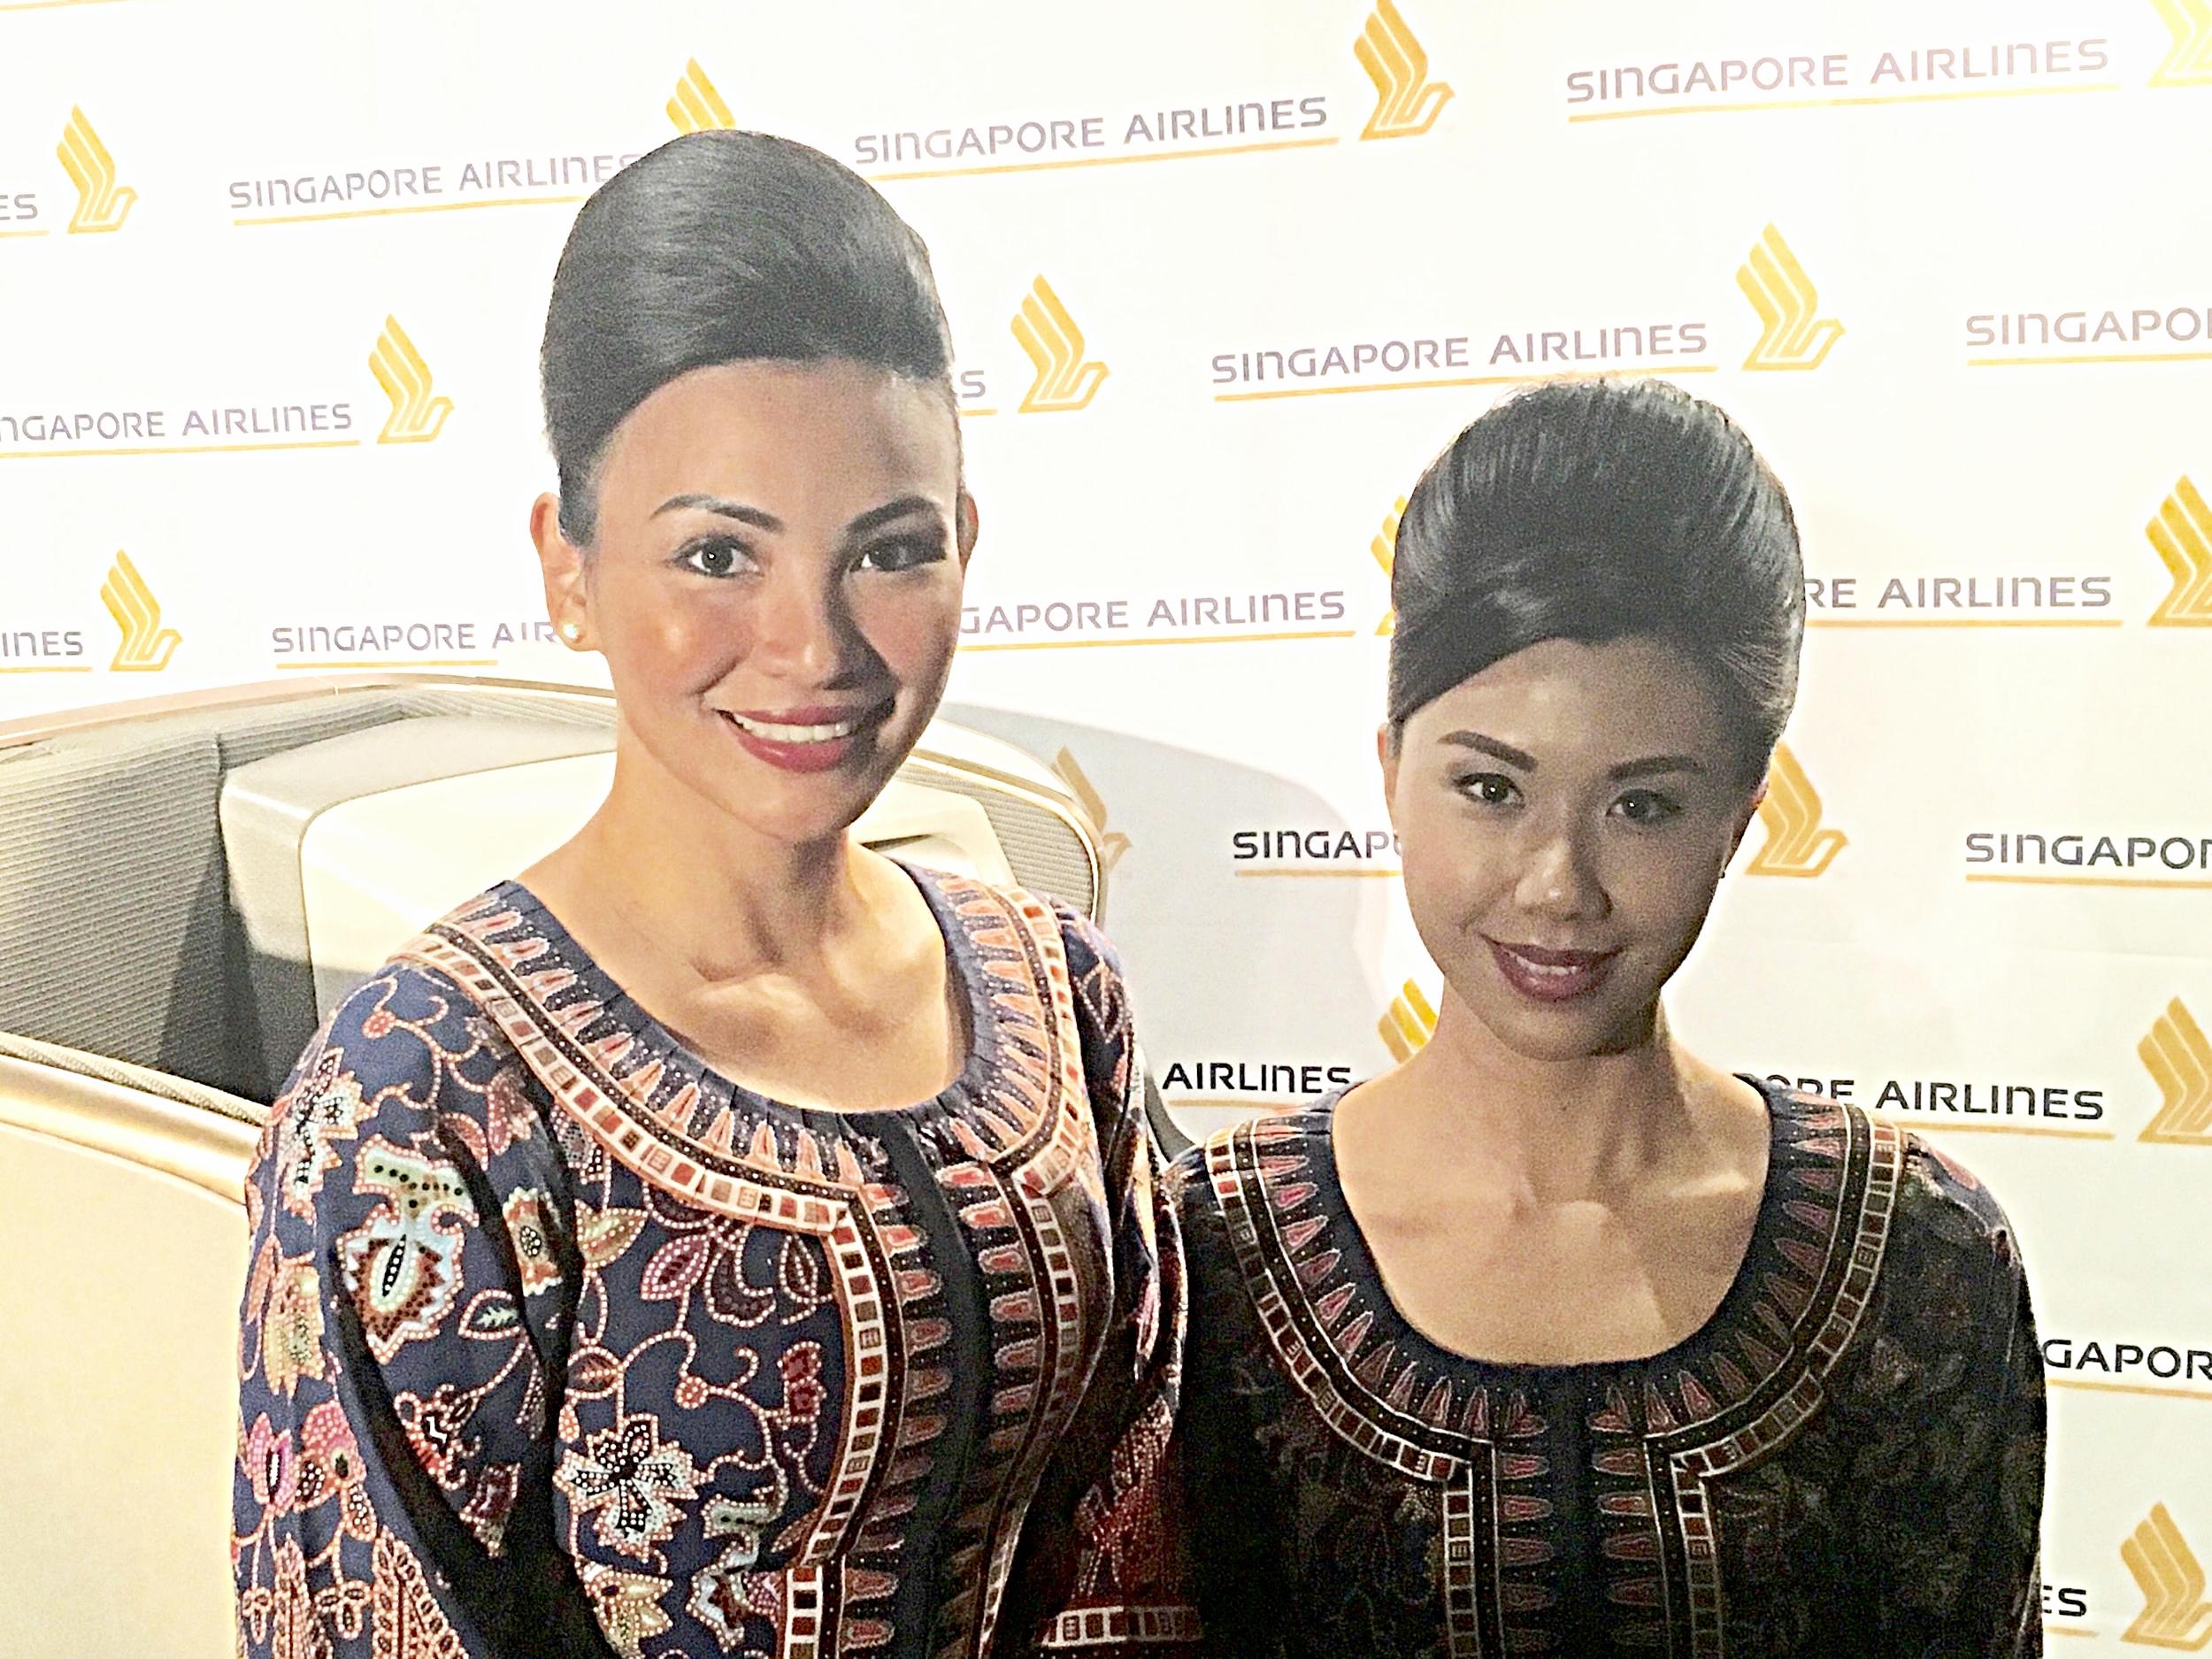 Beautiful Ladies of Singapore Airlines - Travel Massive LA